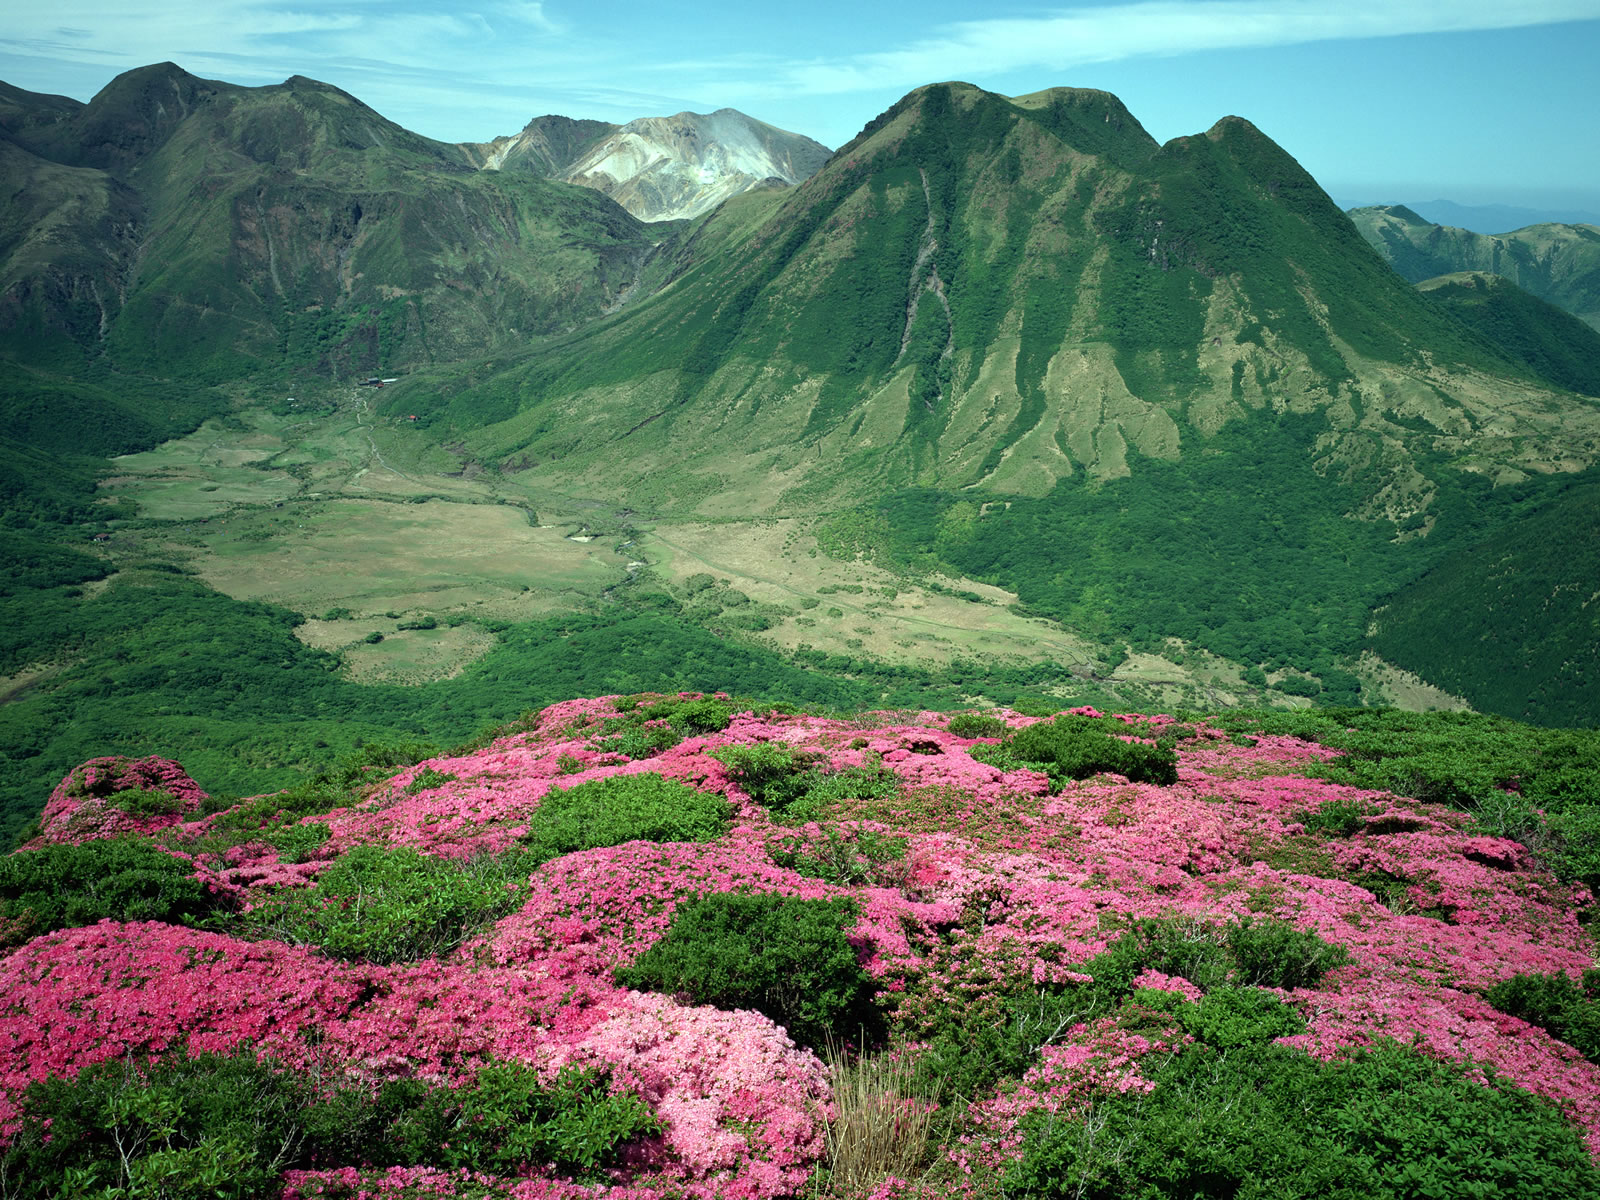 Download Mountain Valleys wallpaper green mountain range 1600x1200